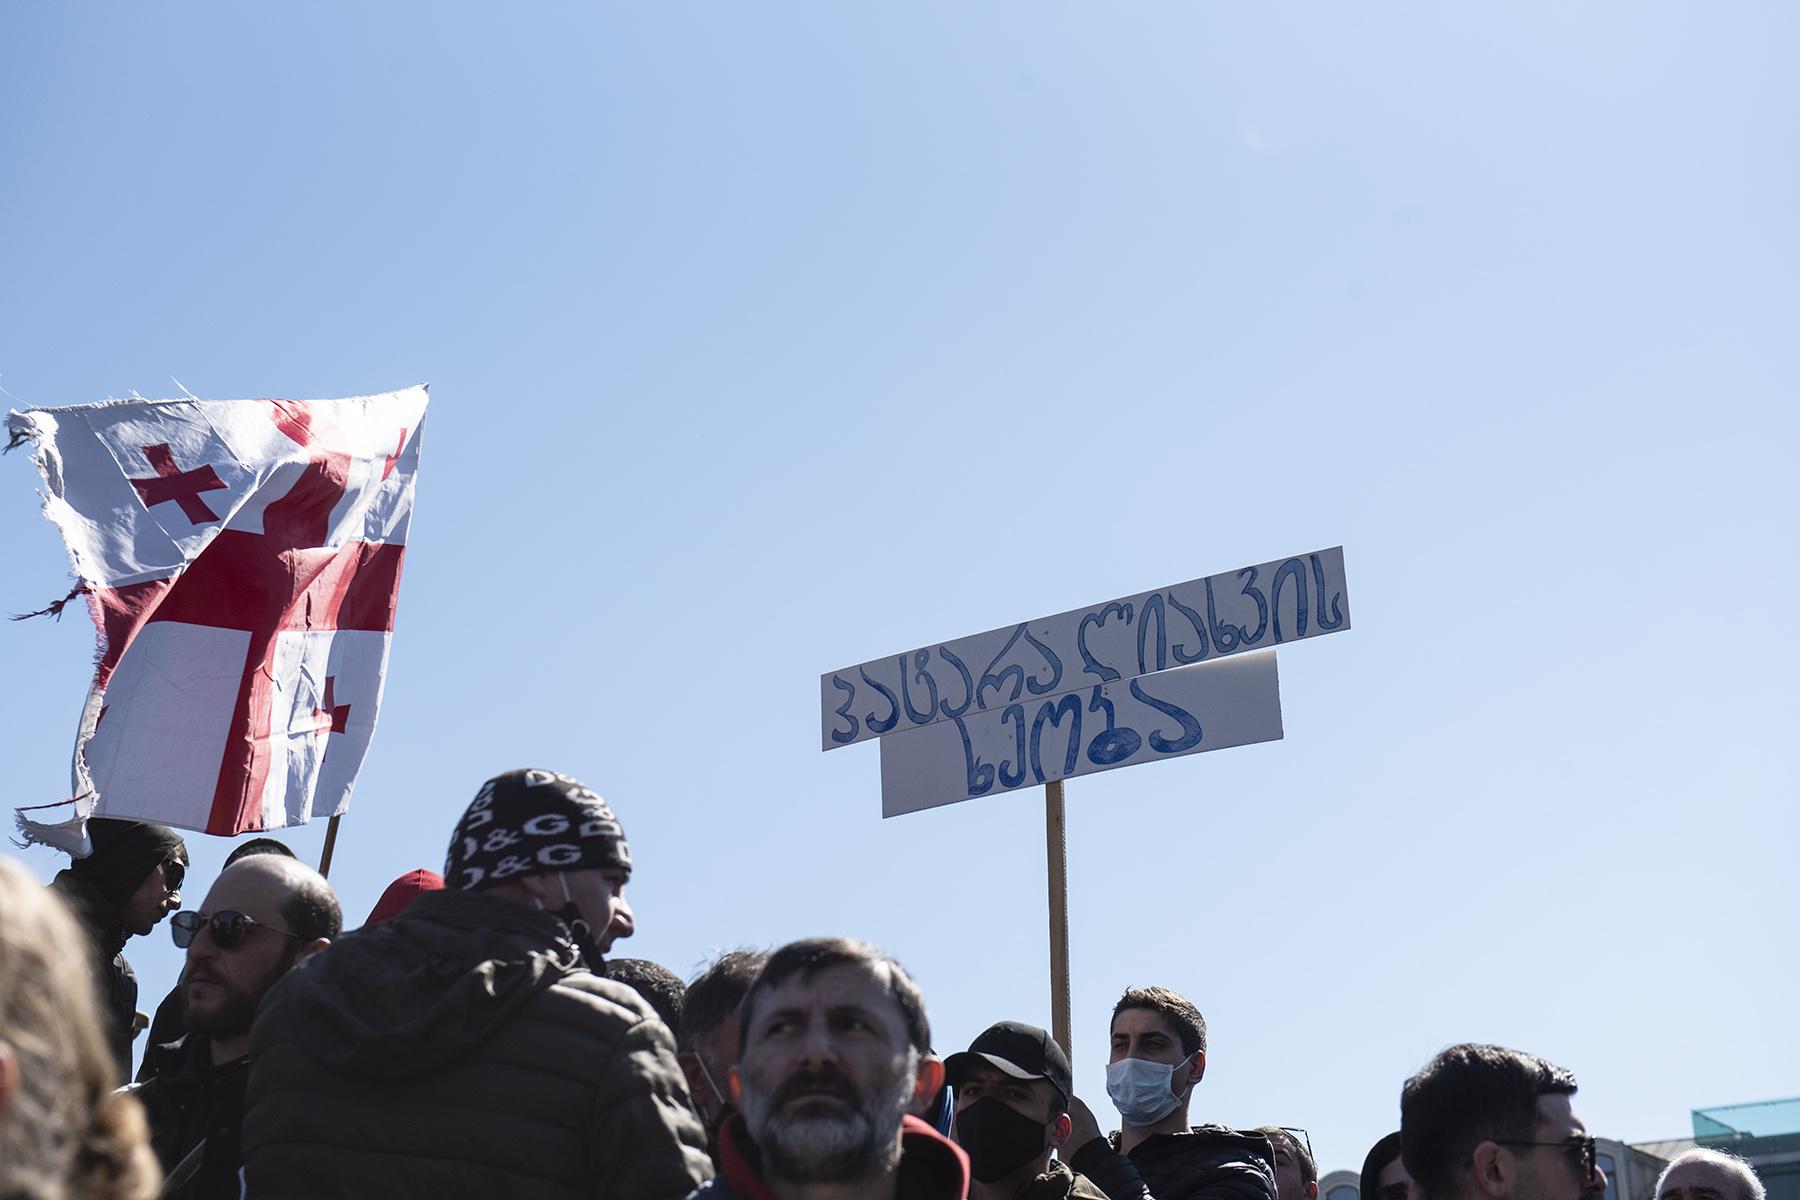 Плакат: «Долина Патара Лиахви». Фото: Мариам Никурадзе/OC Media